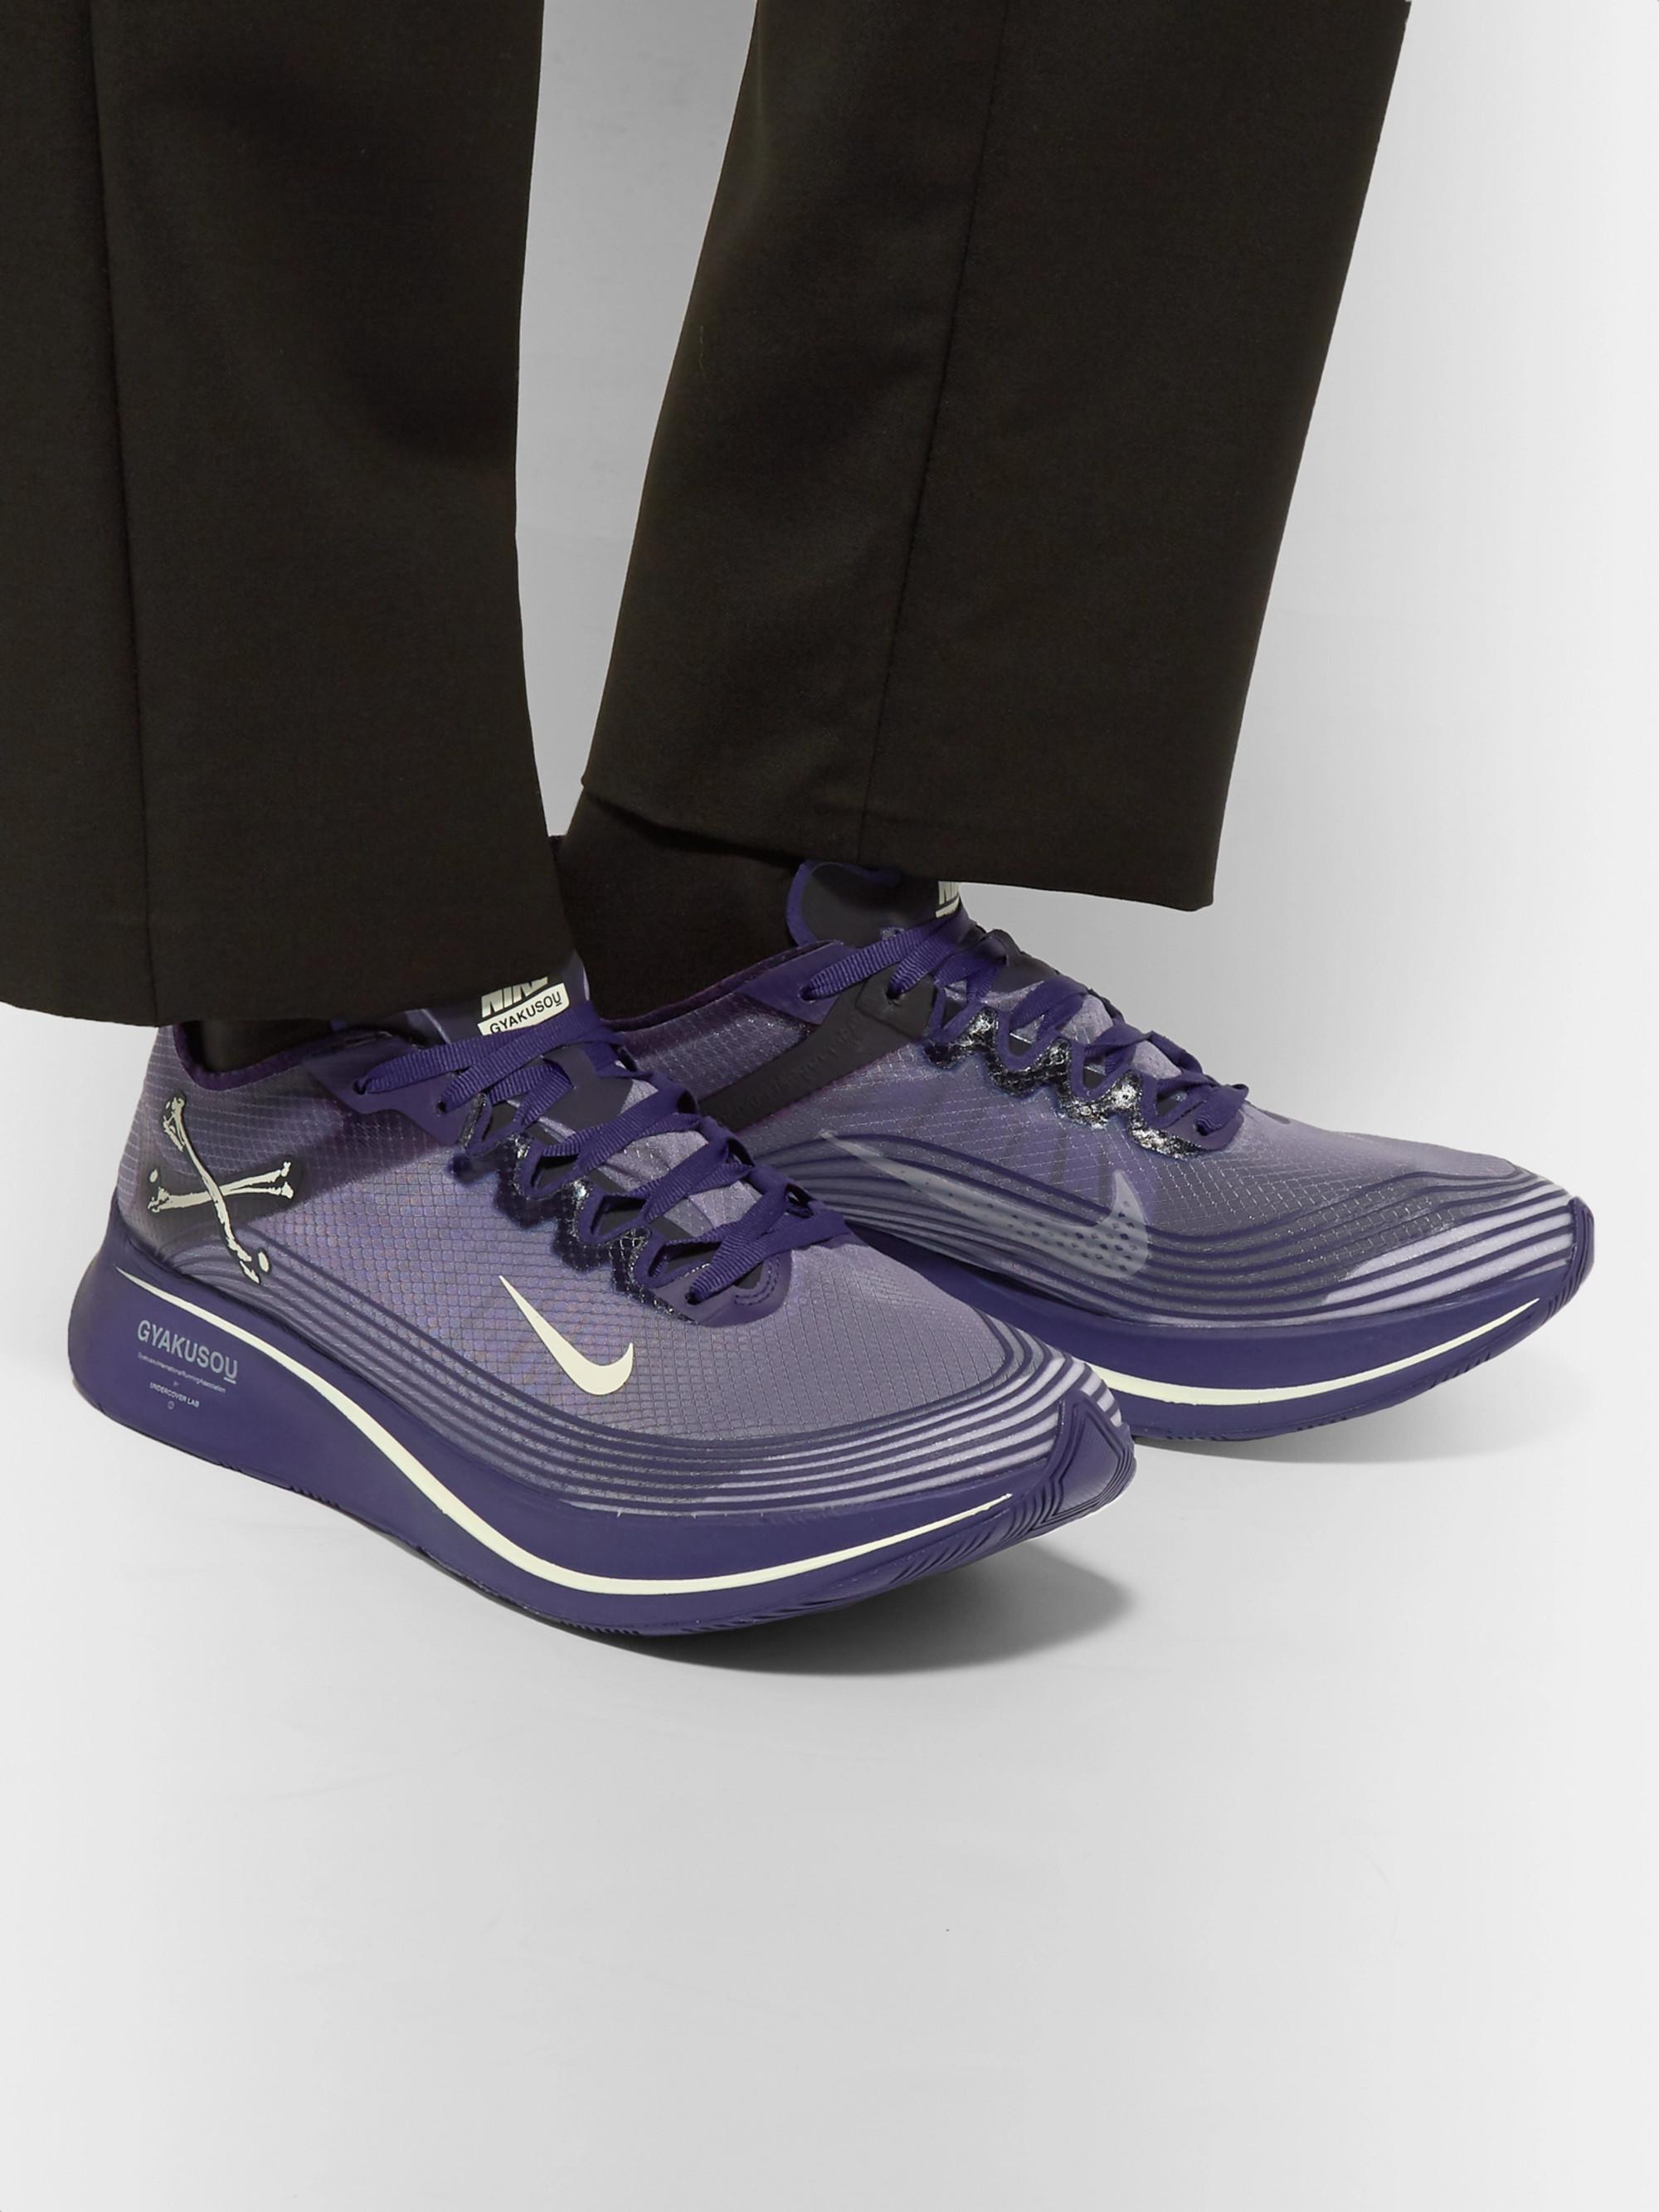 38c12ee9 Purple + GYAKUSOU Zoom Fly SP Ripstop Sneakers | Nike x Undercover ...